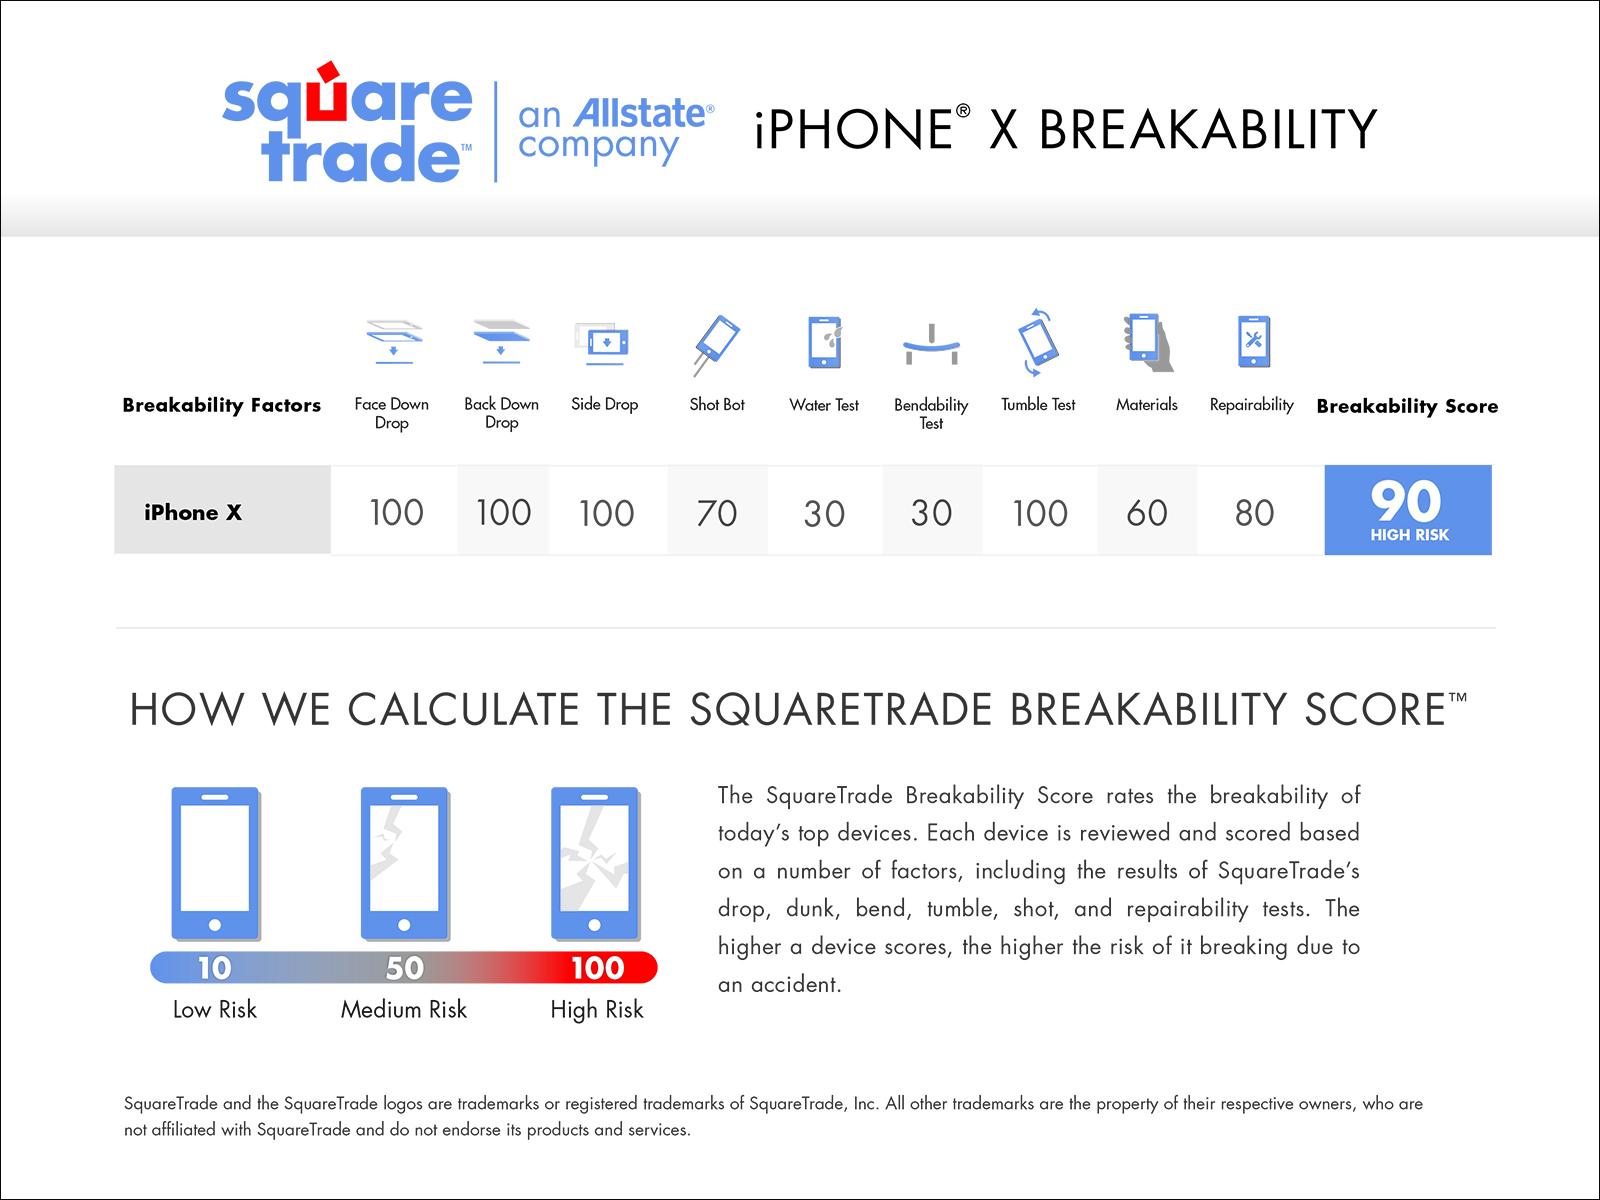 iPhoneXBreakabilityScorecard.jpg